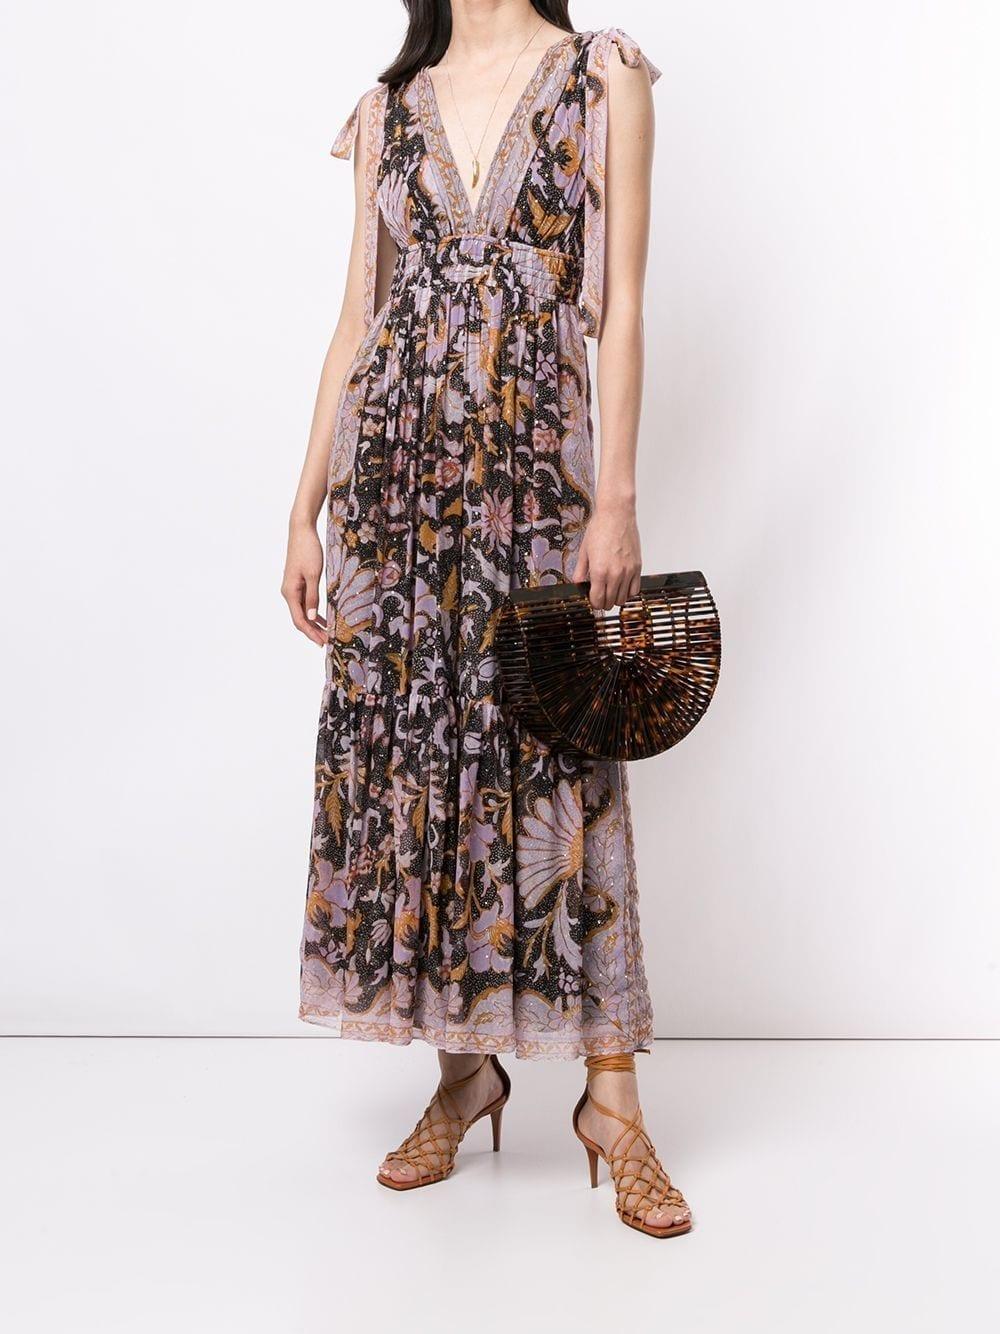 ULLA JOHNSON Floral Print Annalise Dress